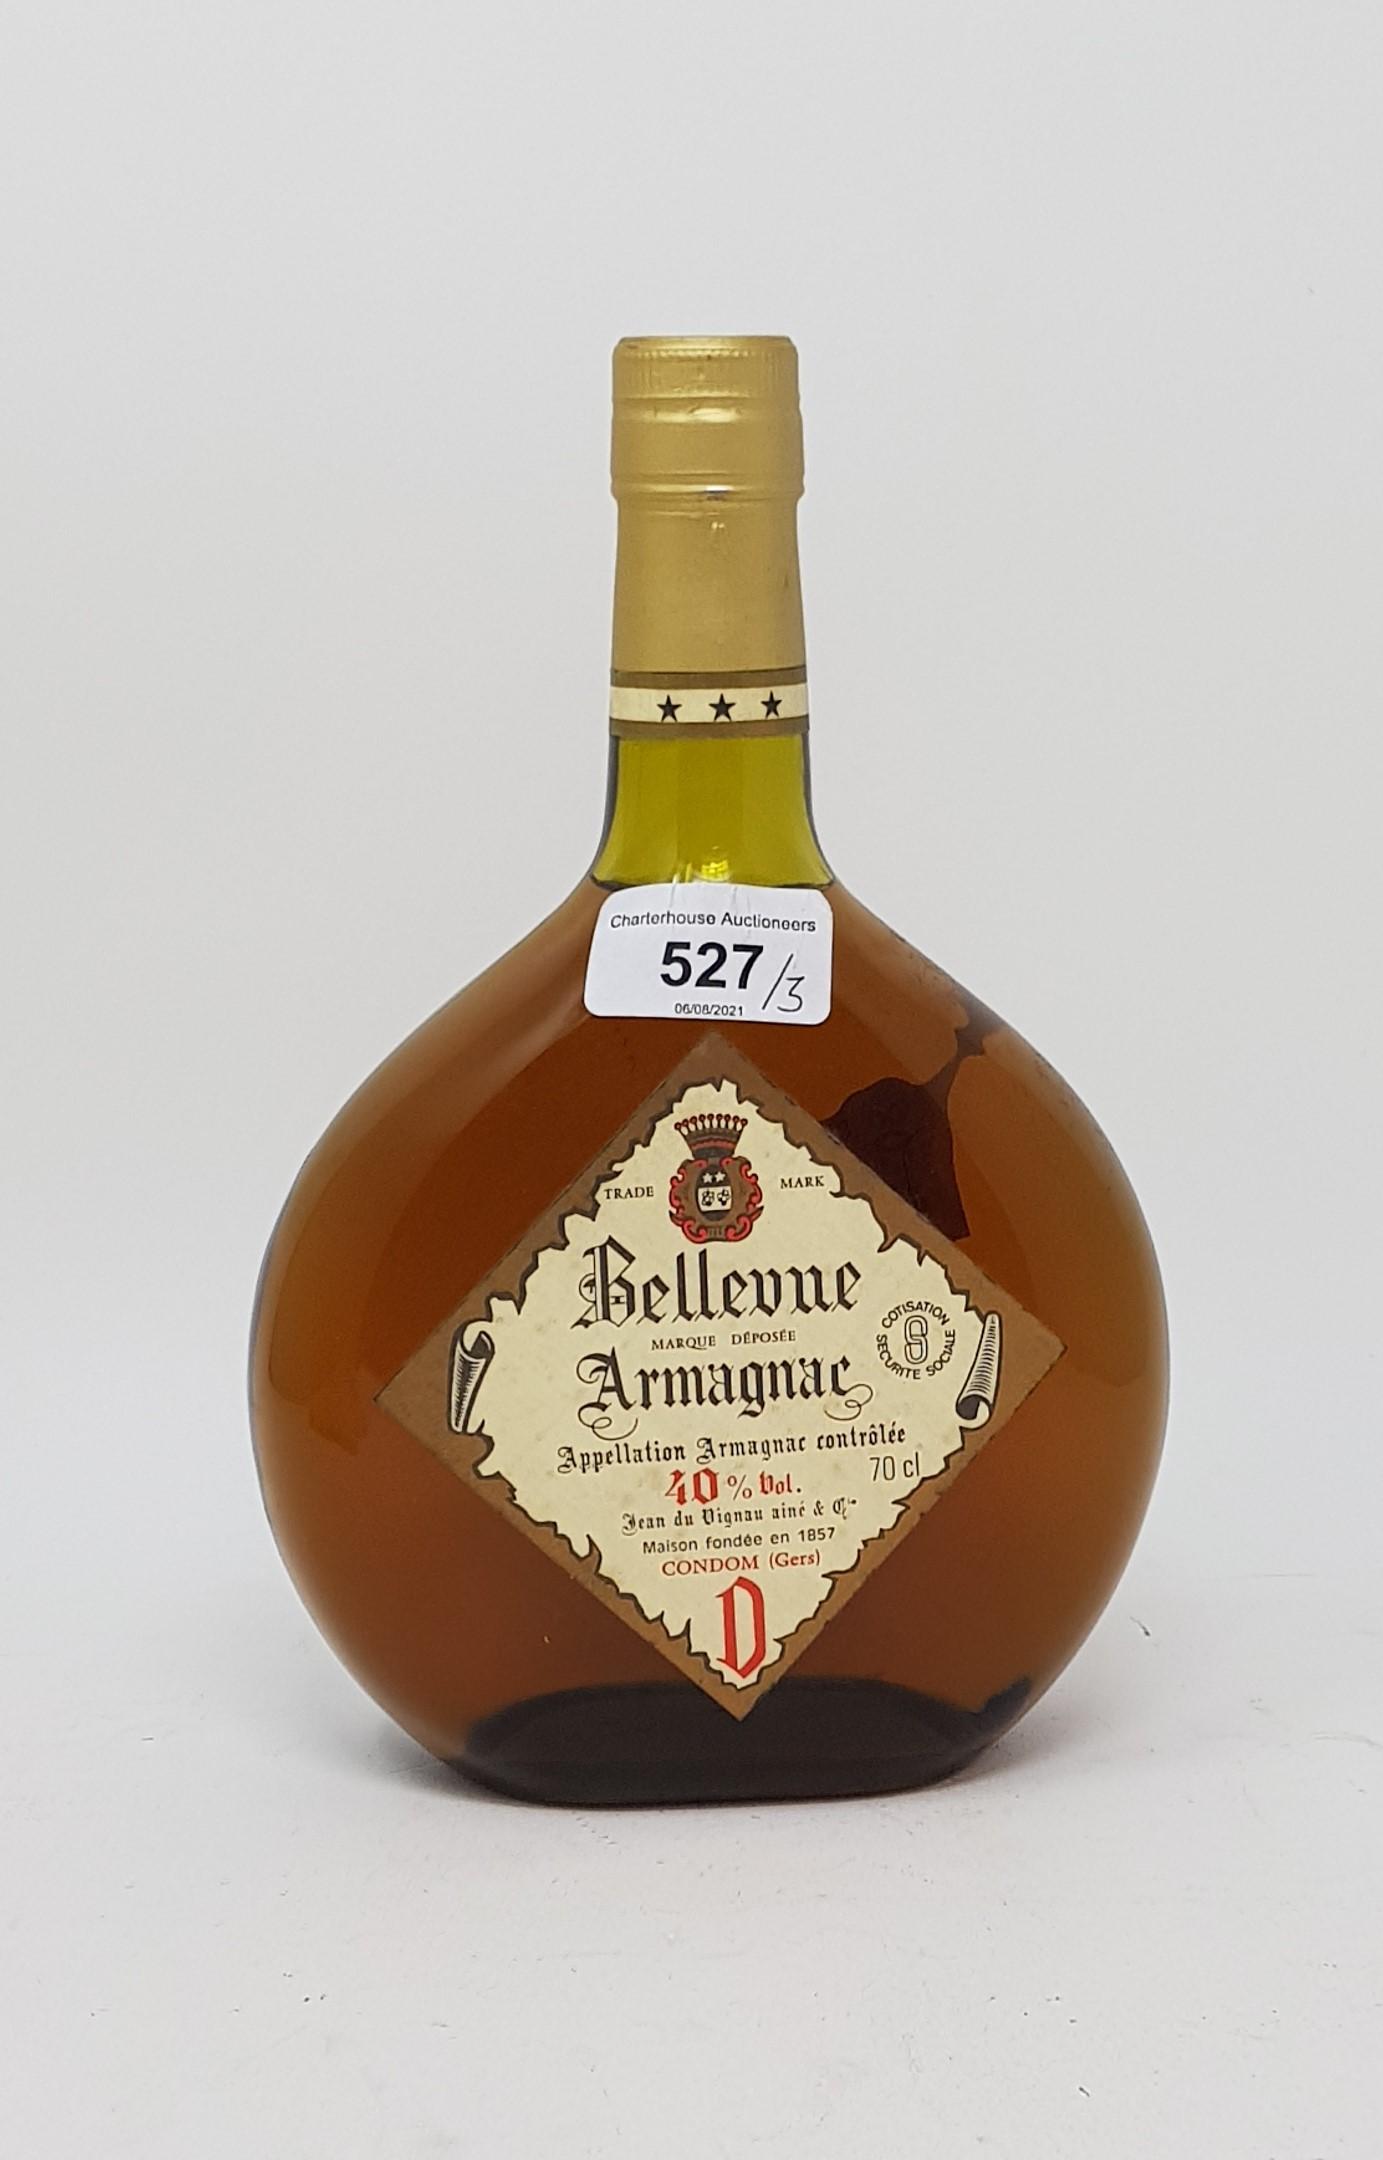 A 70cl bottle of Belle Vue Armagnac, a 350ml bottle of Remy Martin cognac, and a 70cl bottle of